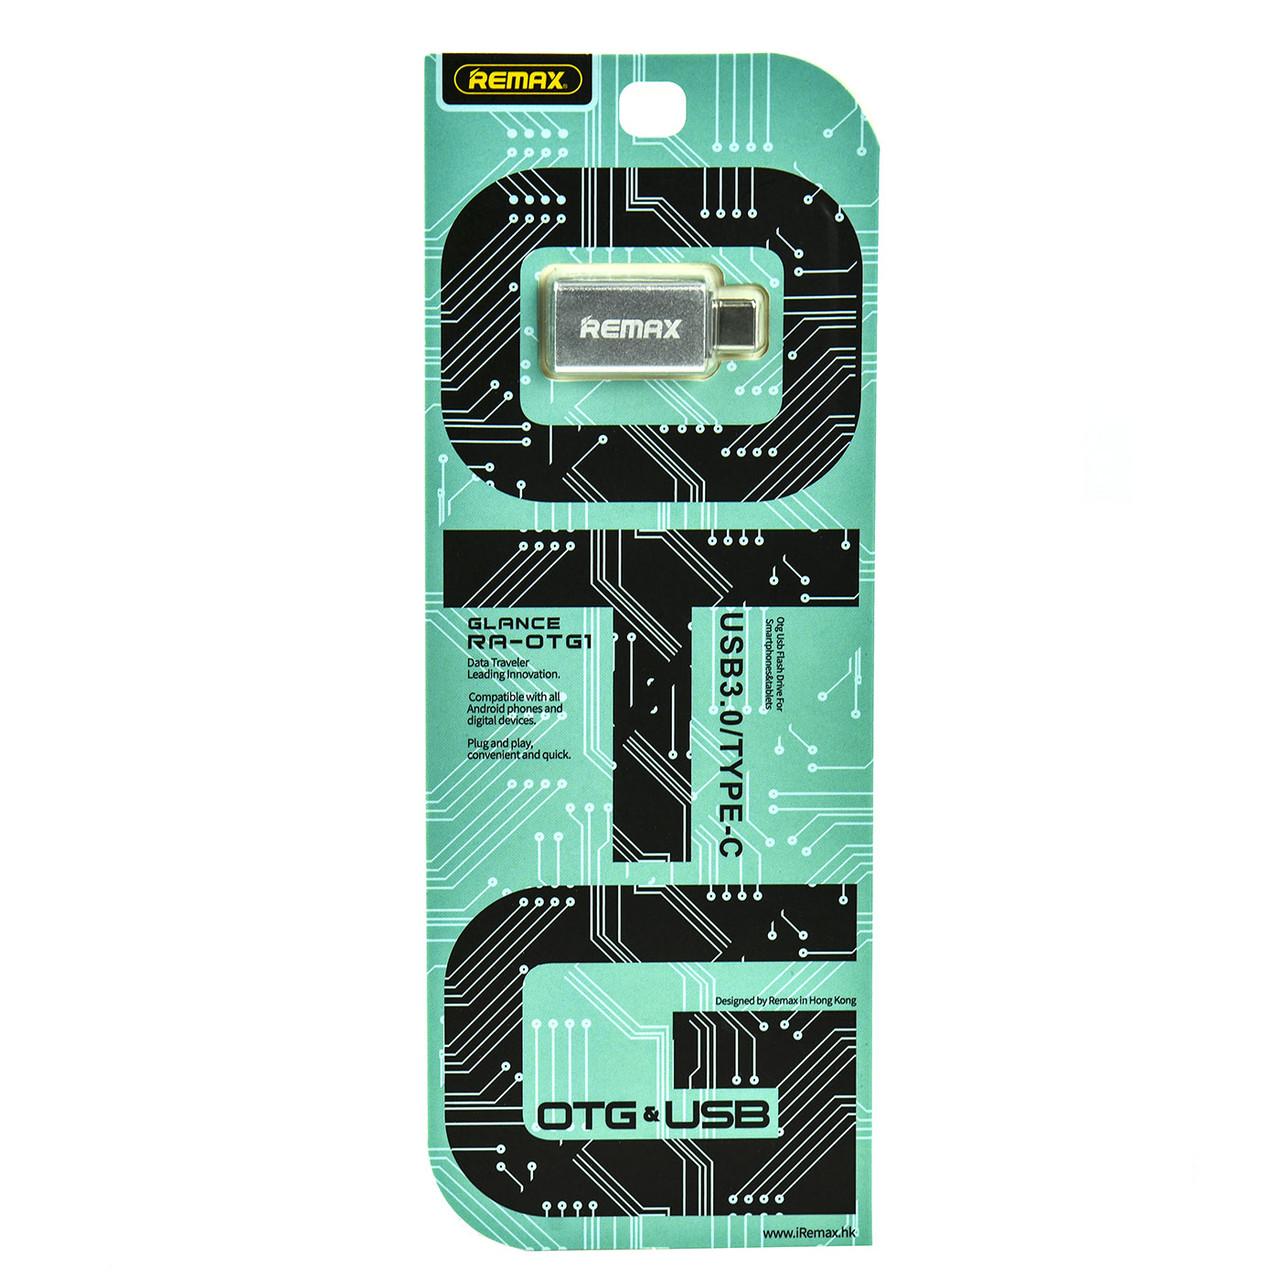 Переходник Type-C Male to USB Female Adapter Converter Remax RA-OTG1 Silver